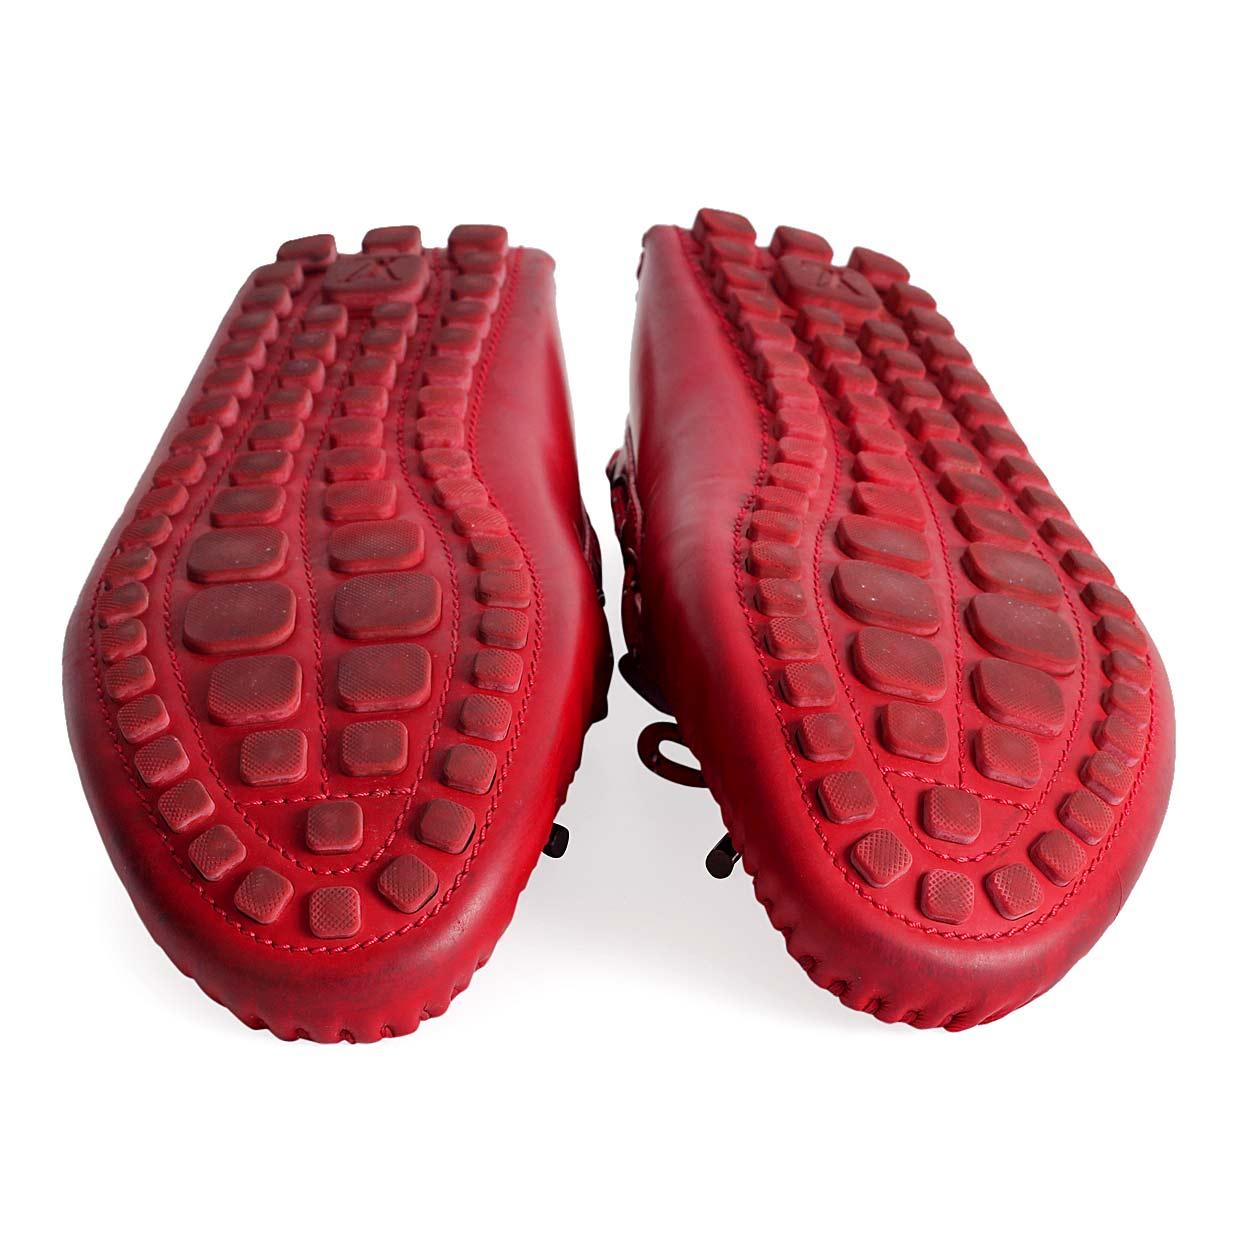 764f06ca9c36 LOUIS VUITTON Arizona Car Shoe red - soles